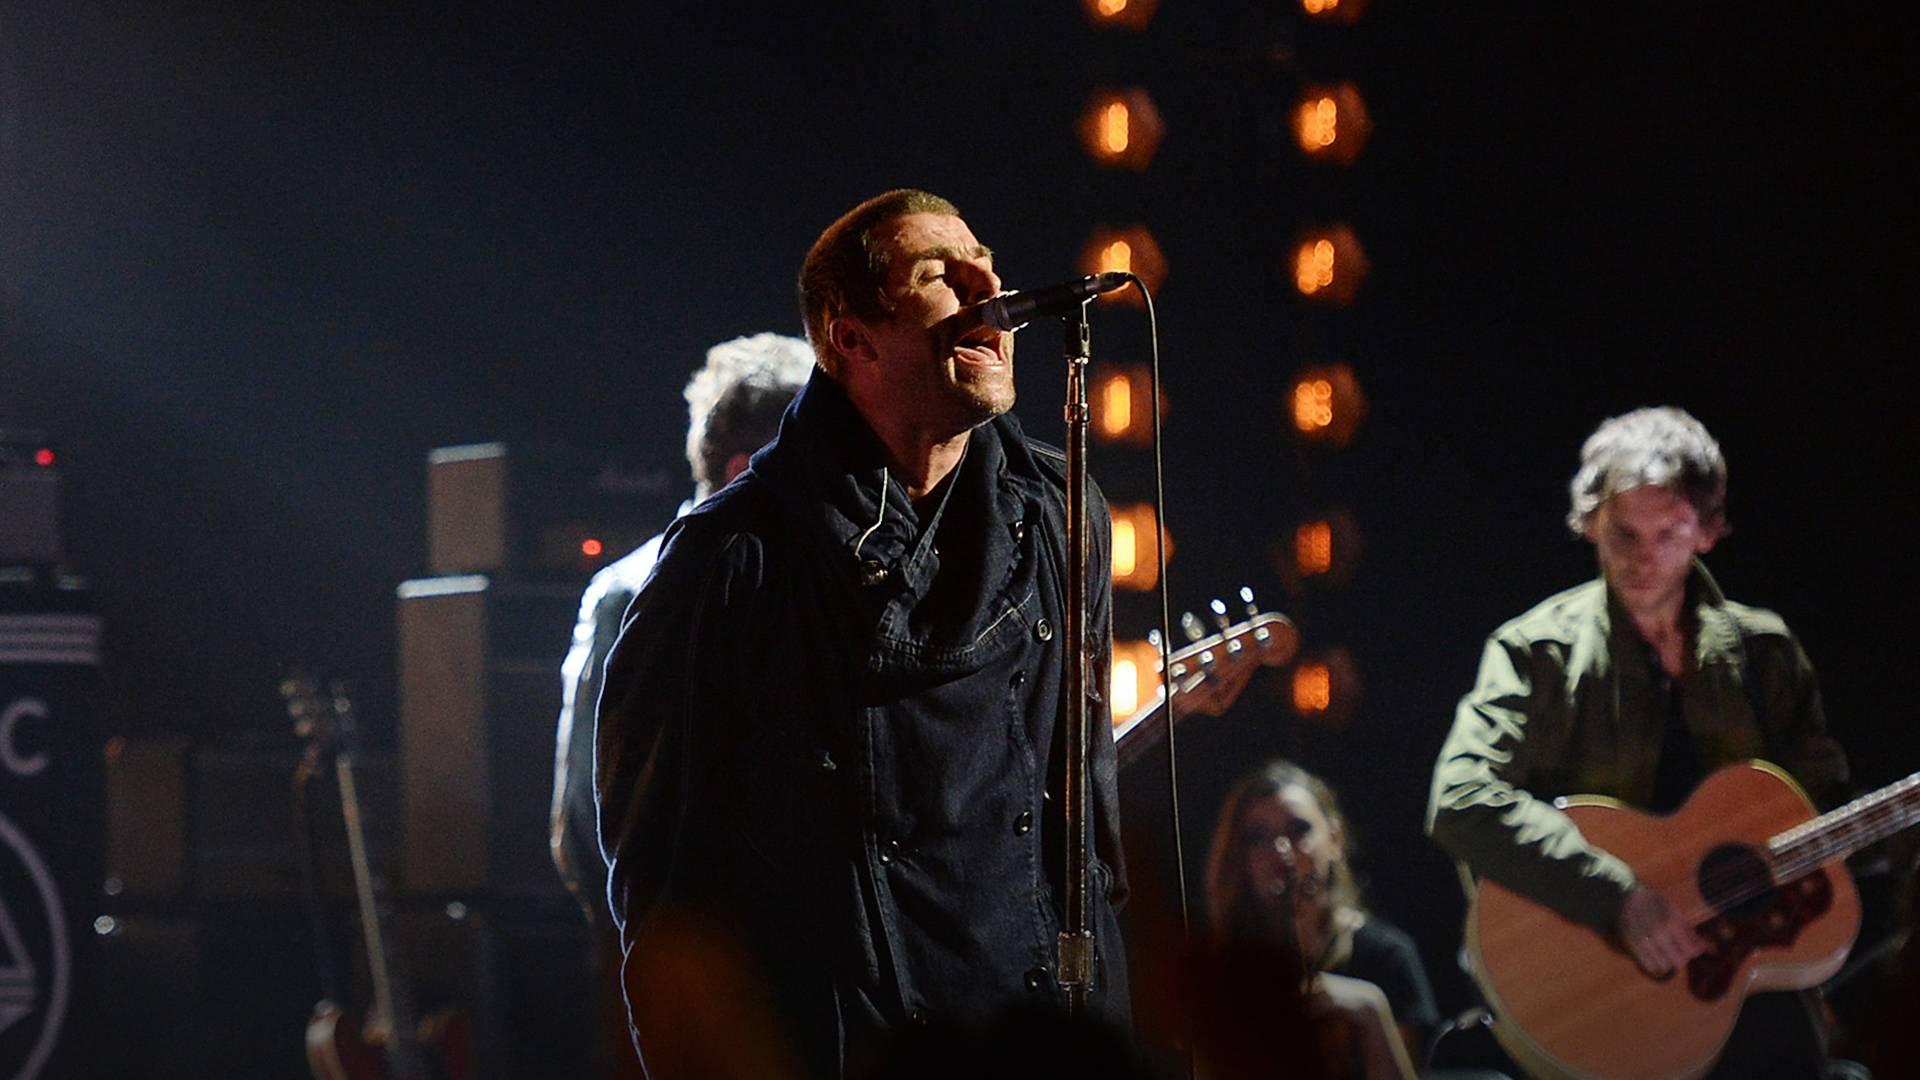 MTV 2019 EMAs   Liam Gallagher Performance   16:9   1920x1080   11/03/19